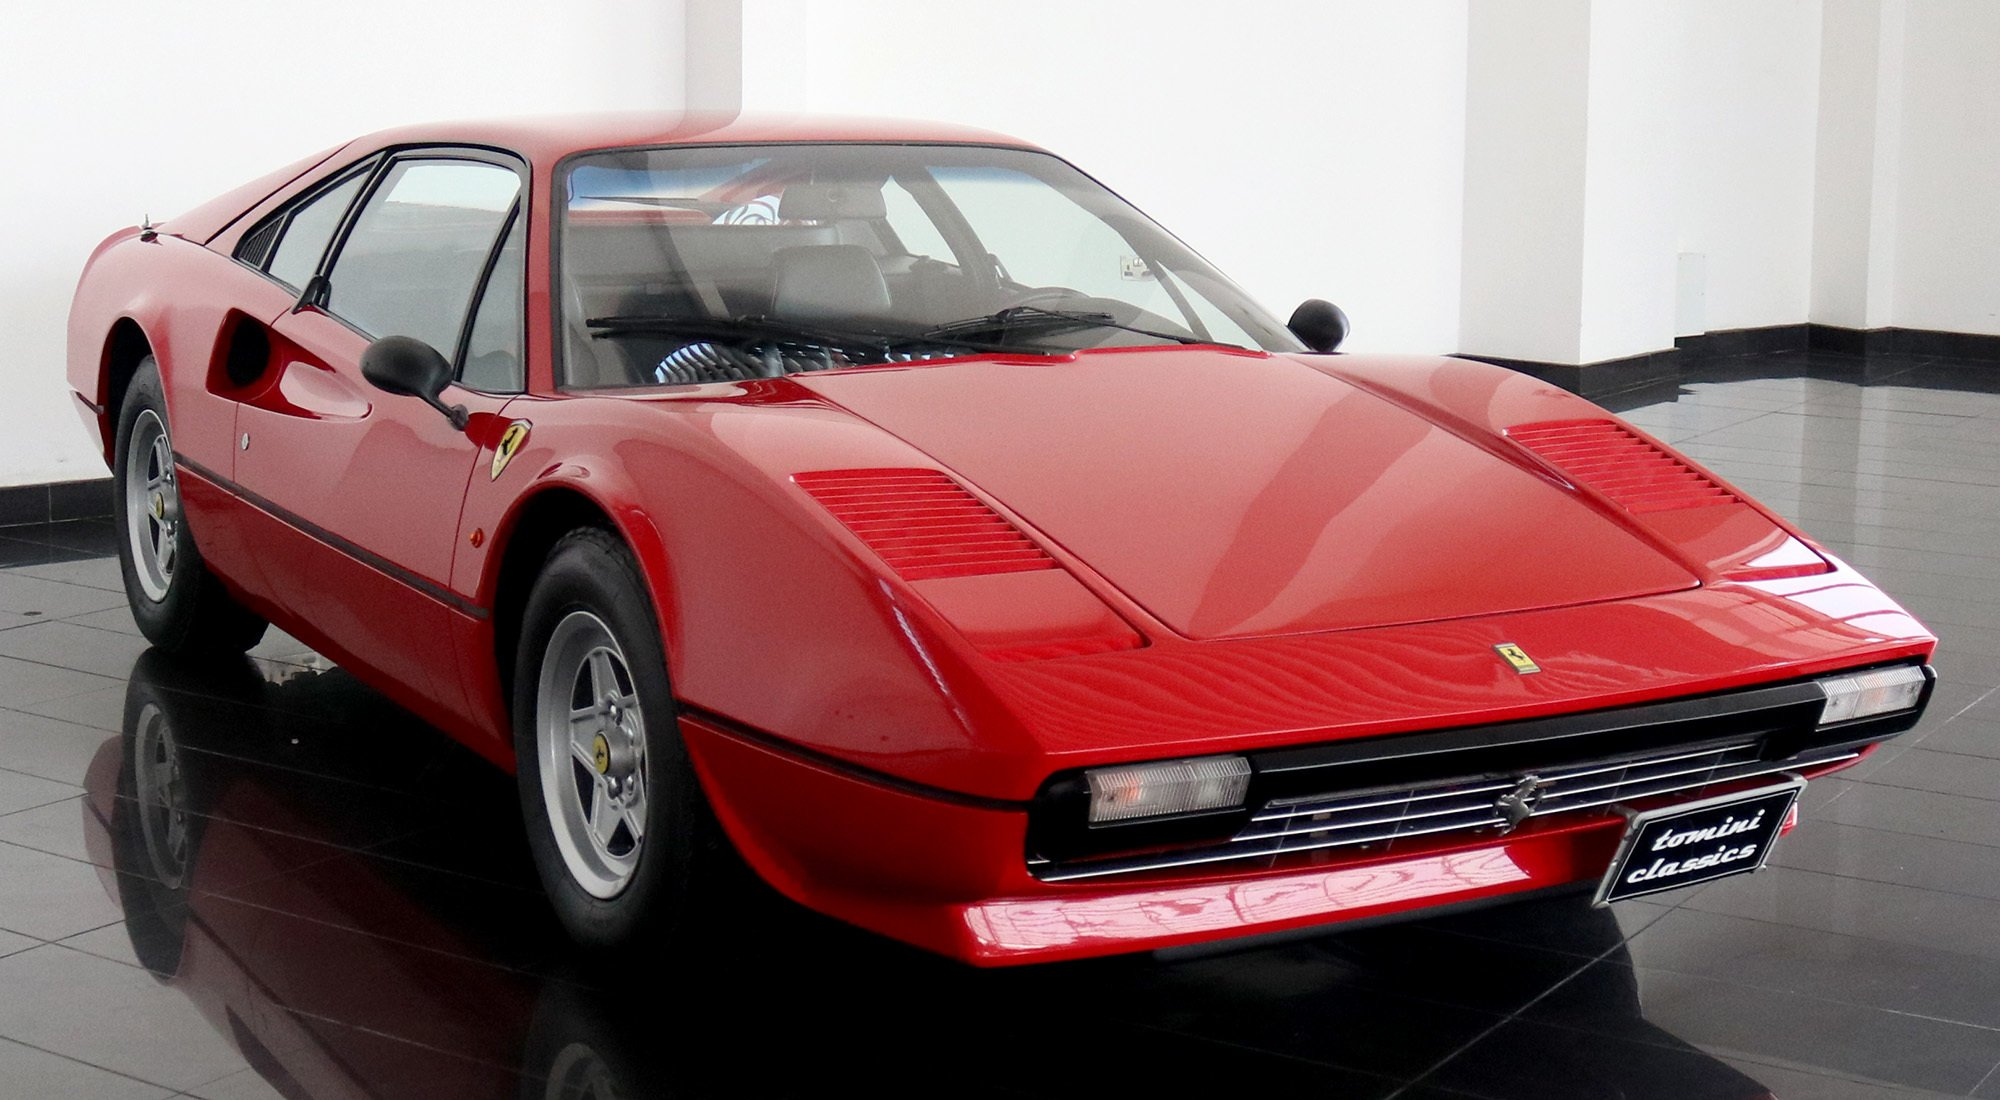 1976 Ferrari 308 Gtb In Al Barsha Dubai United Arab Emirates For Sale 10618706